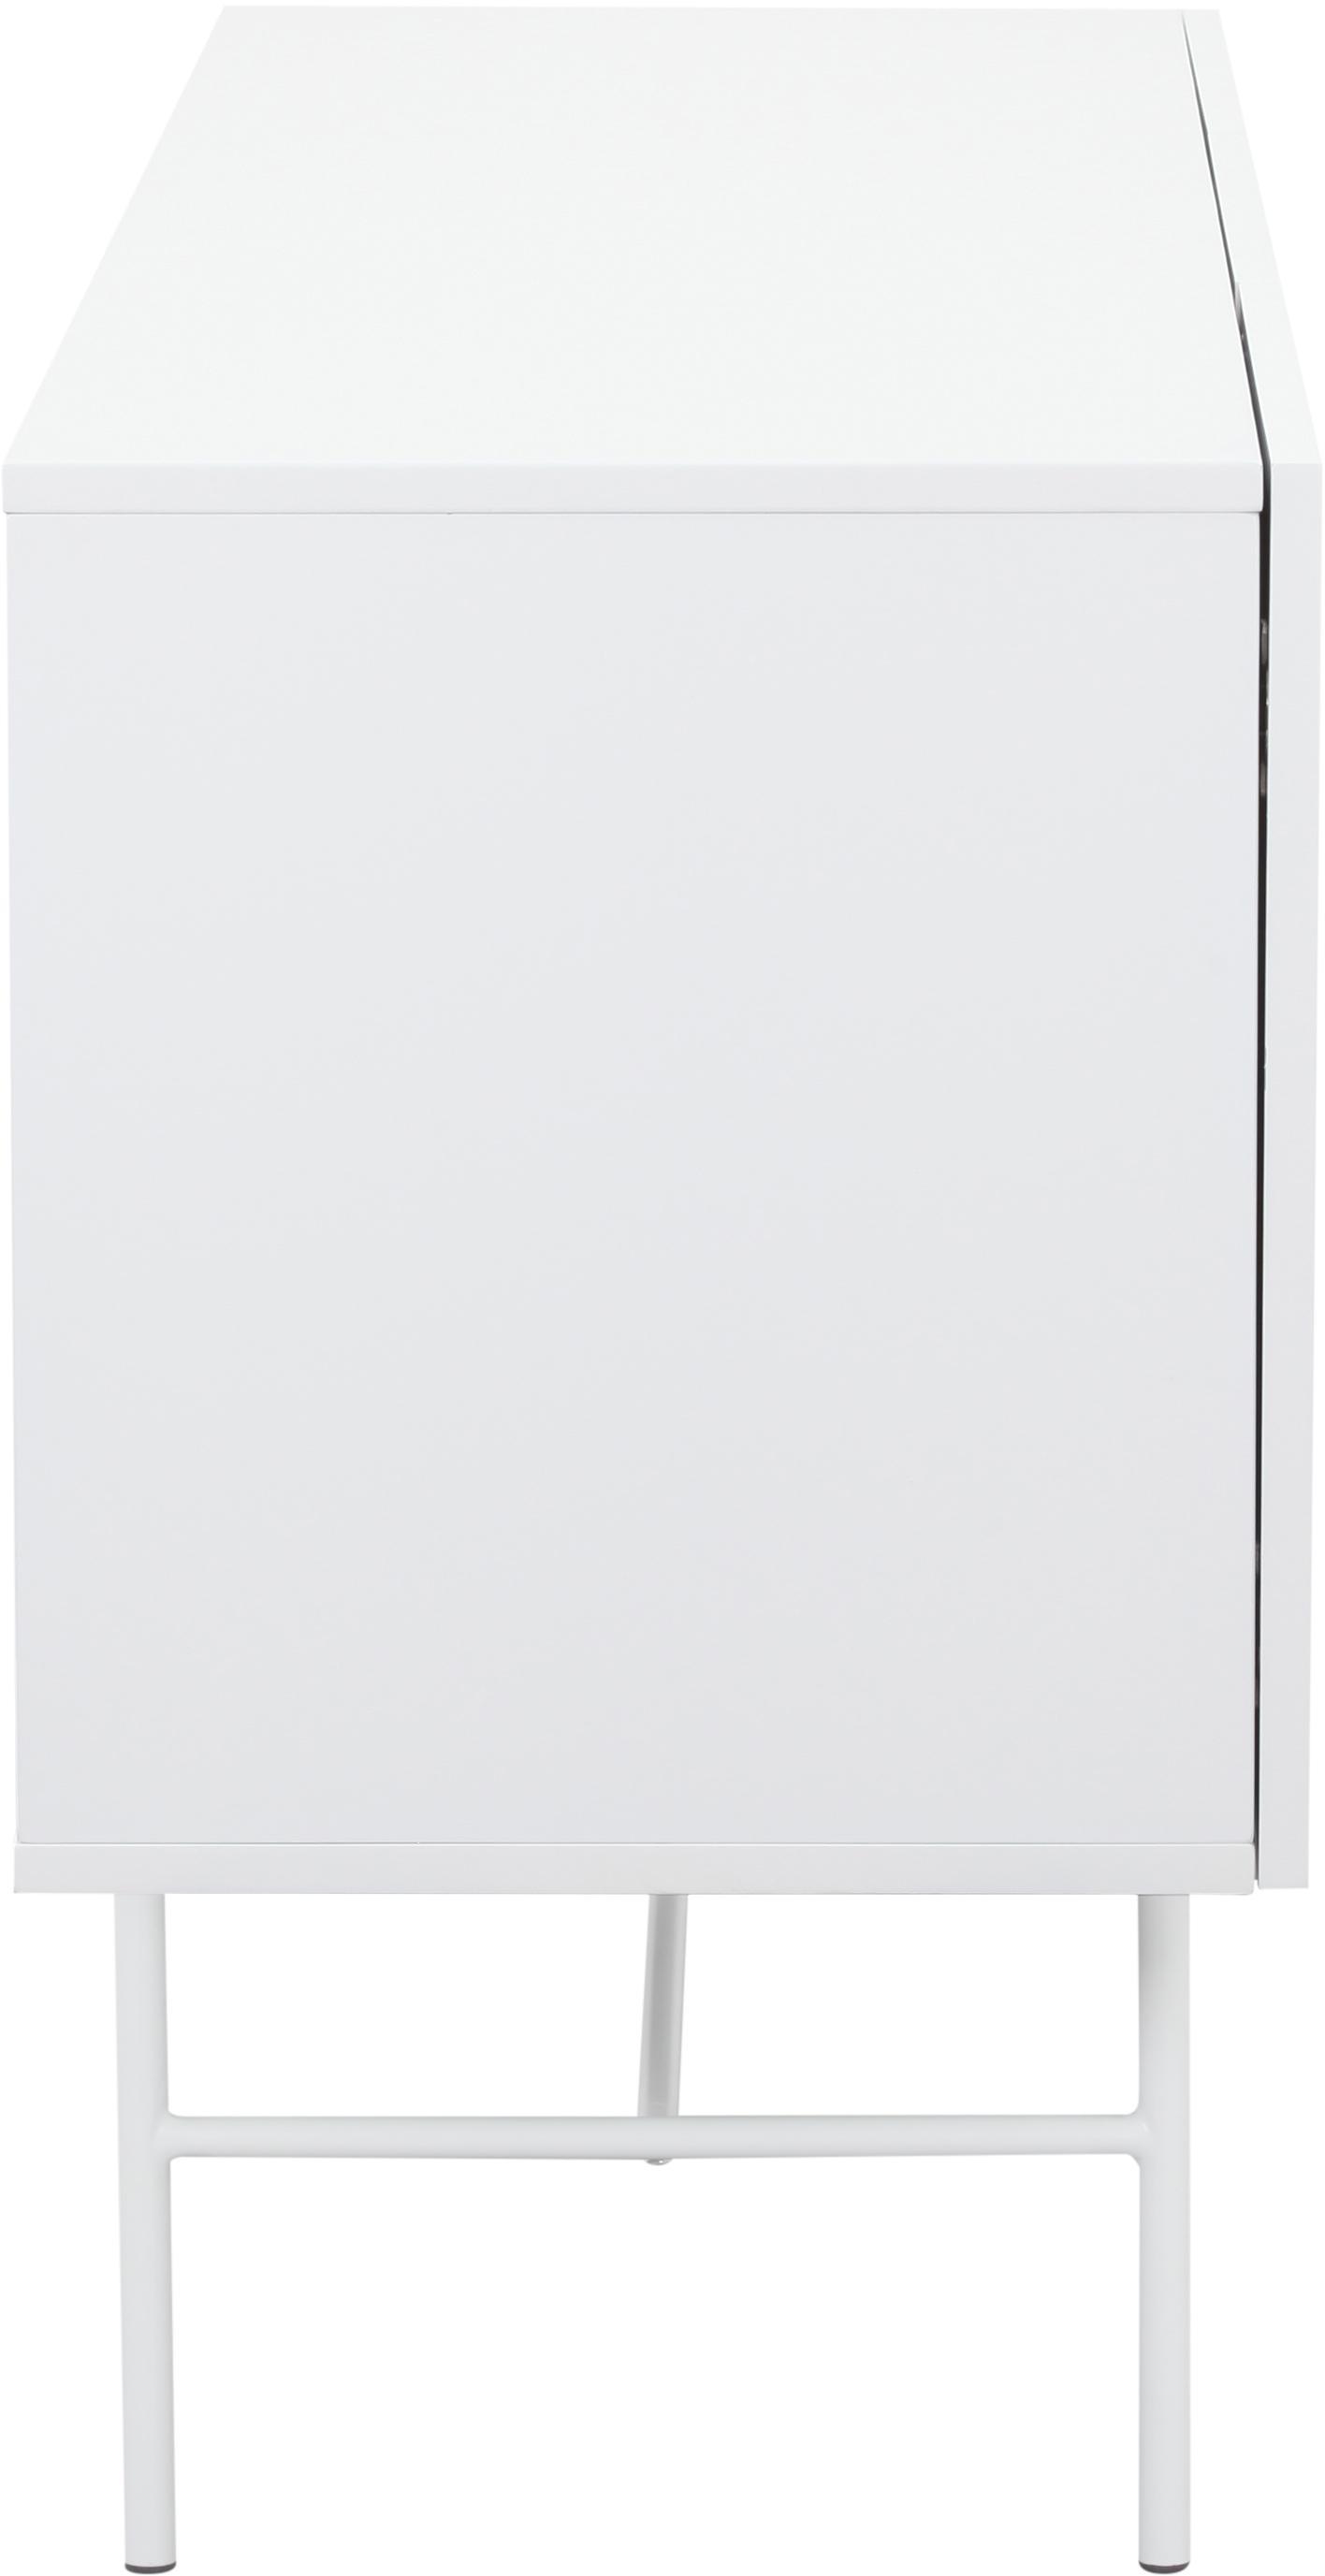 Moderní skříňka Anders, Konstrukce: bílá Nohy: matná bílá